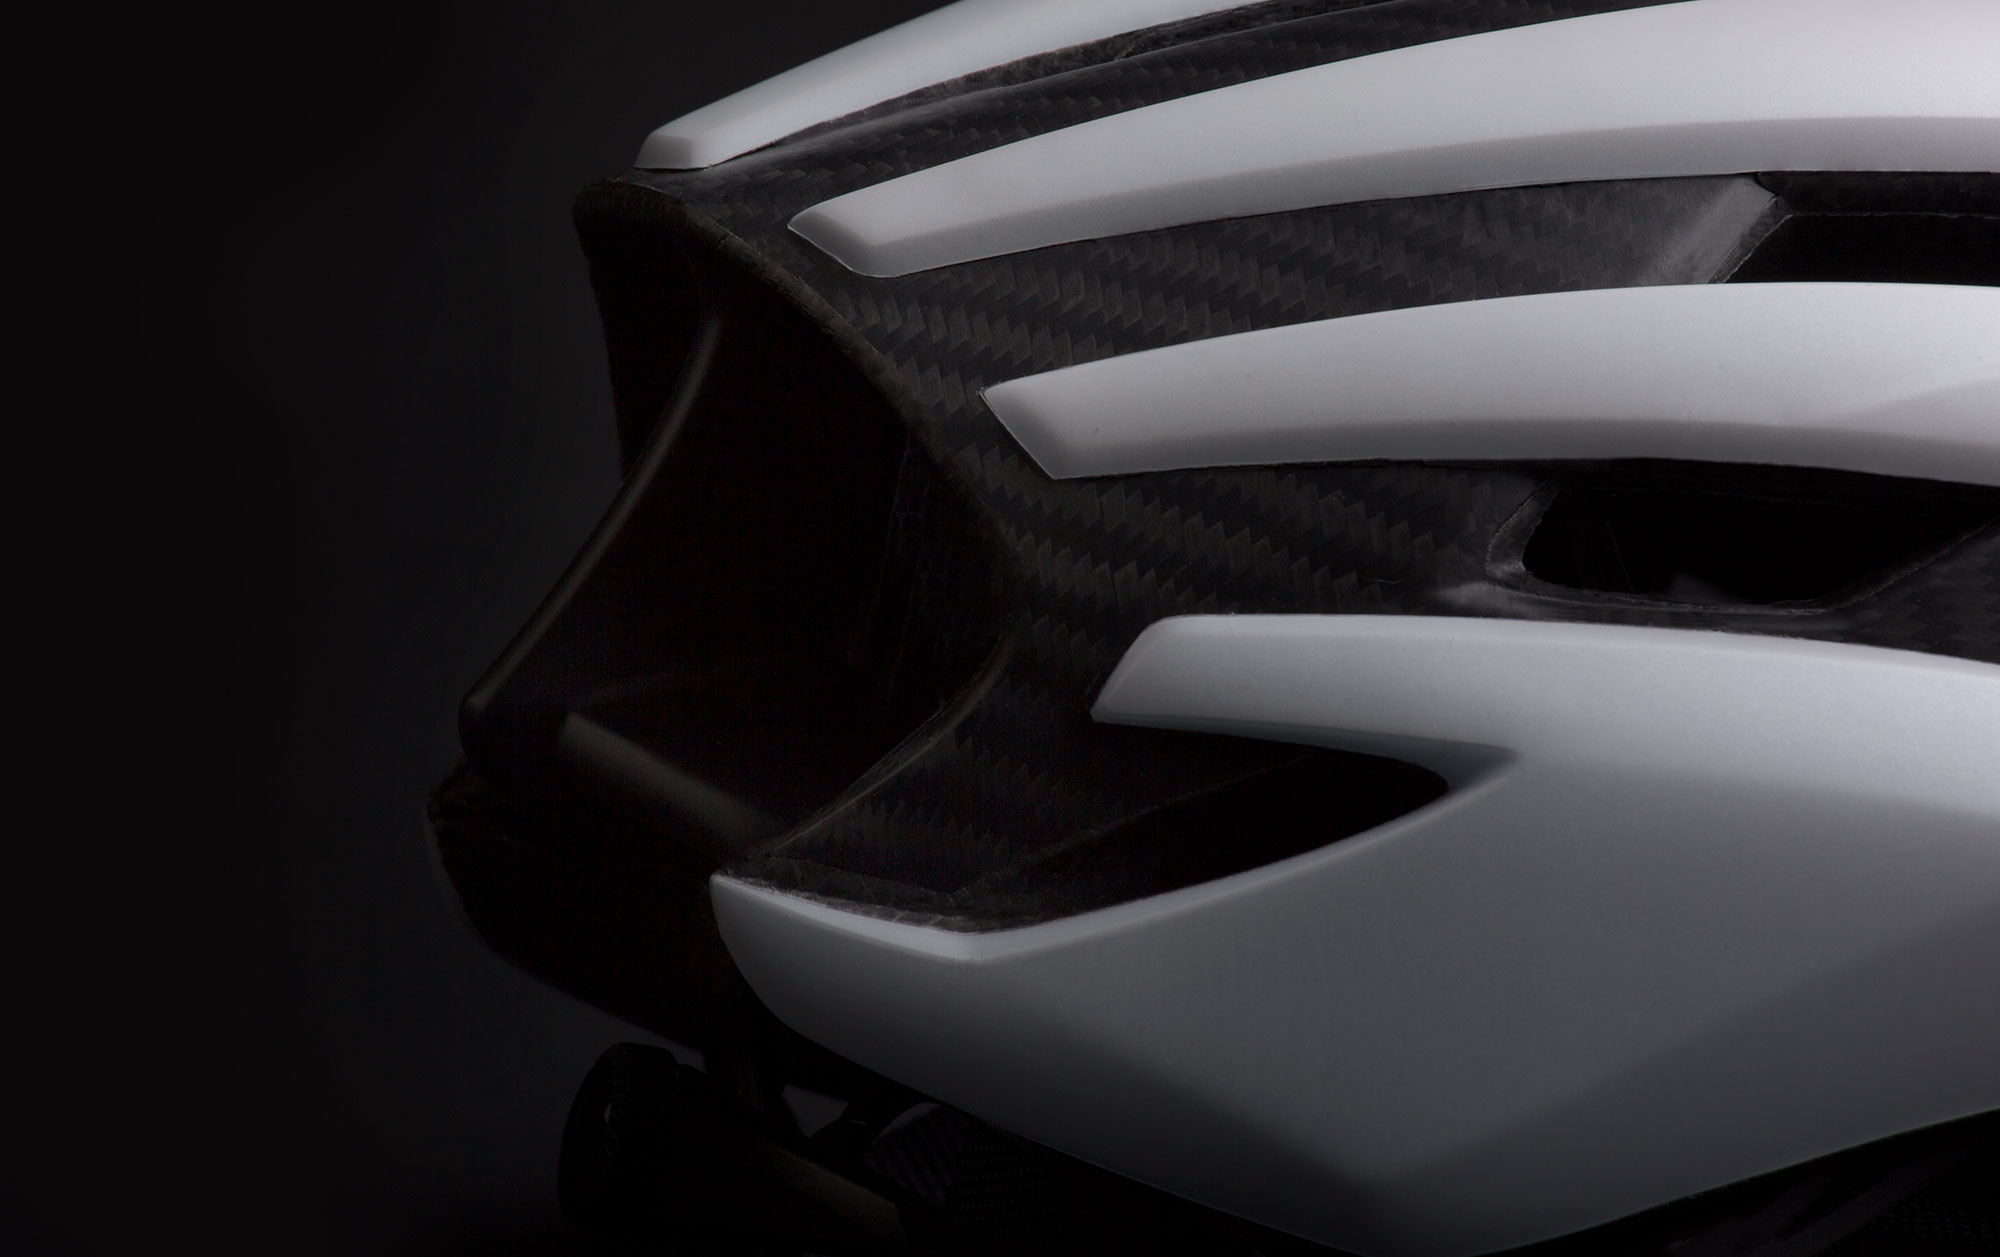 MET Trenta 3K Carbon Road, Aero, Cyclocross and Gravel Helmet tube shape tail